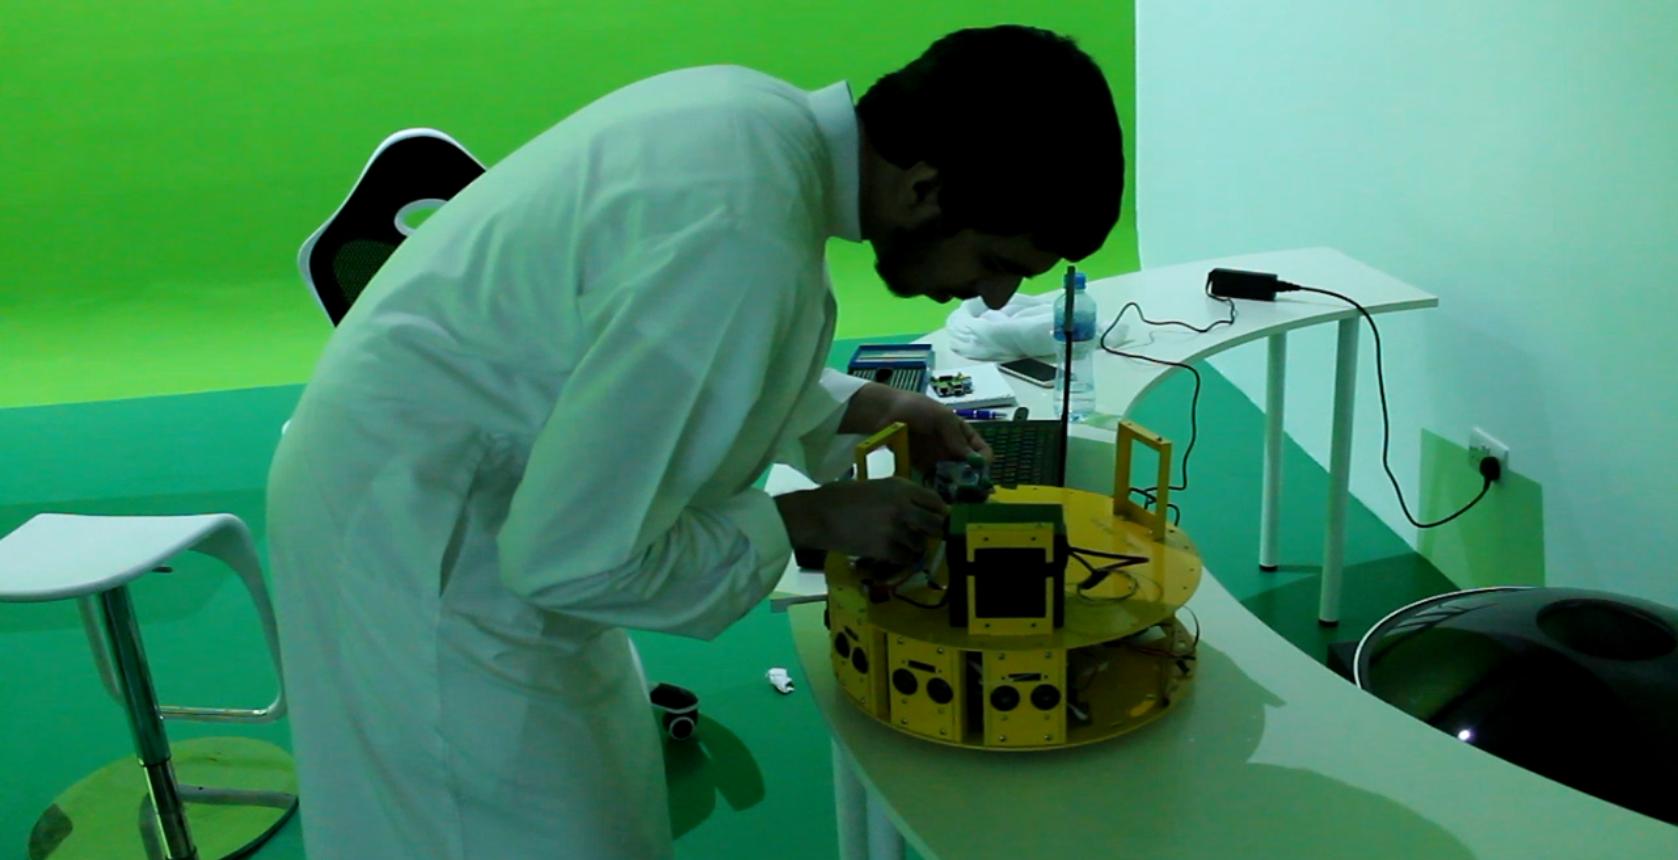 Robot Green Room Slider Photo 1